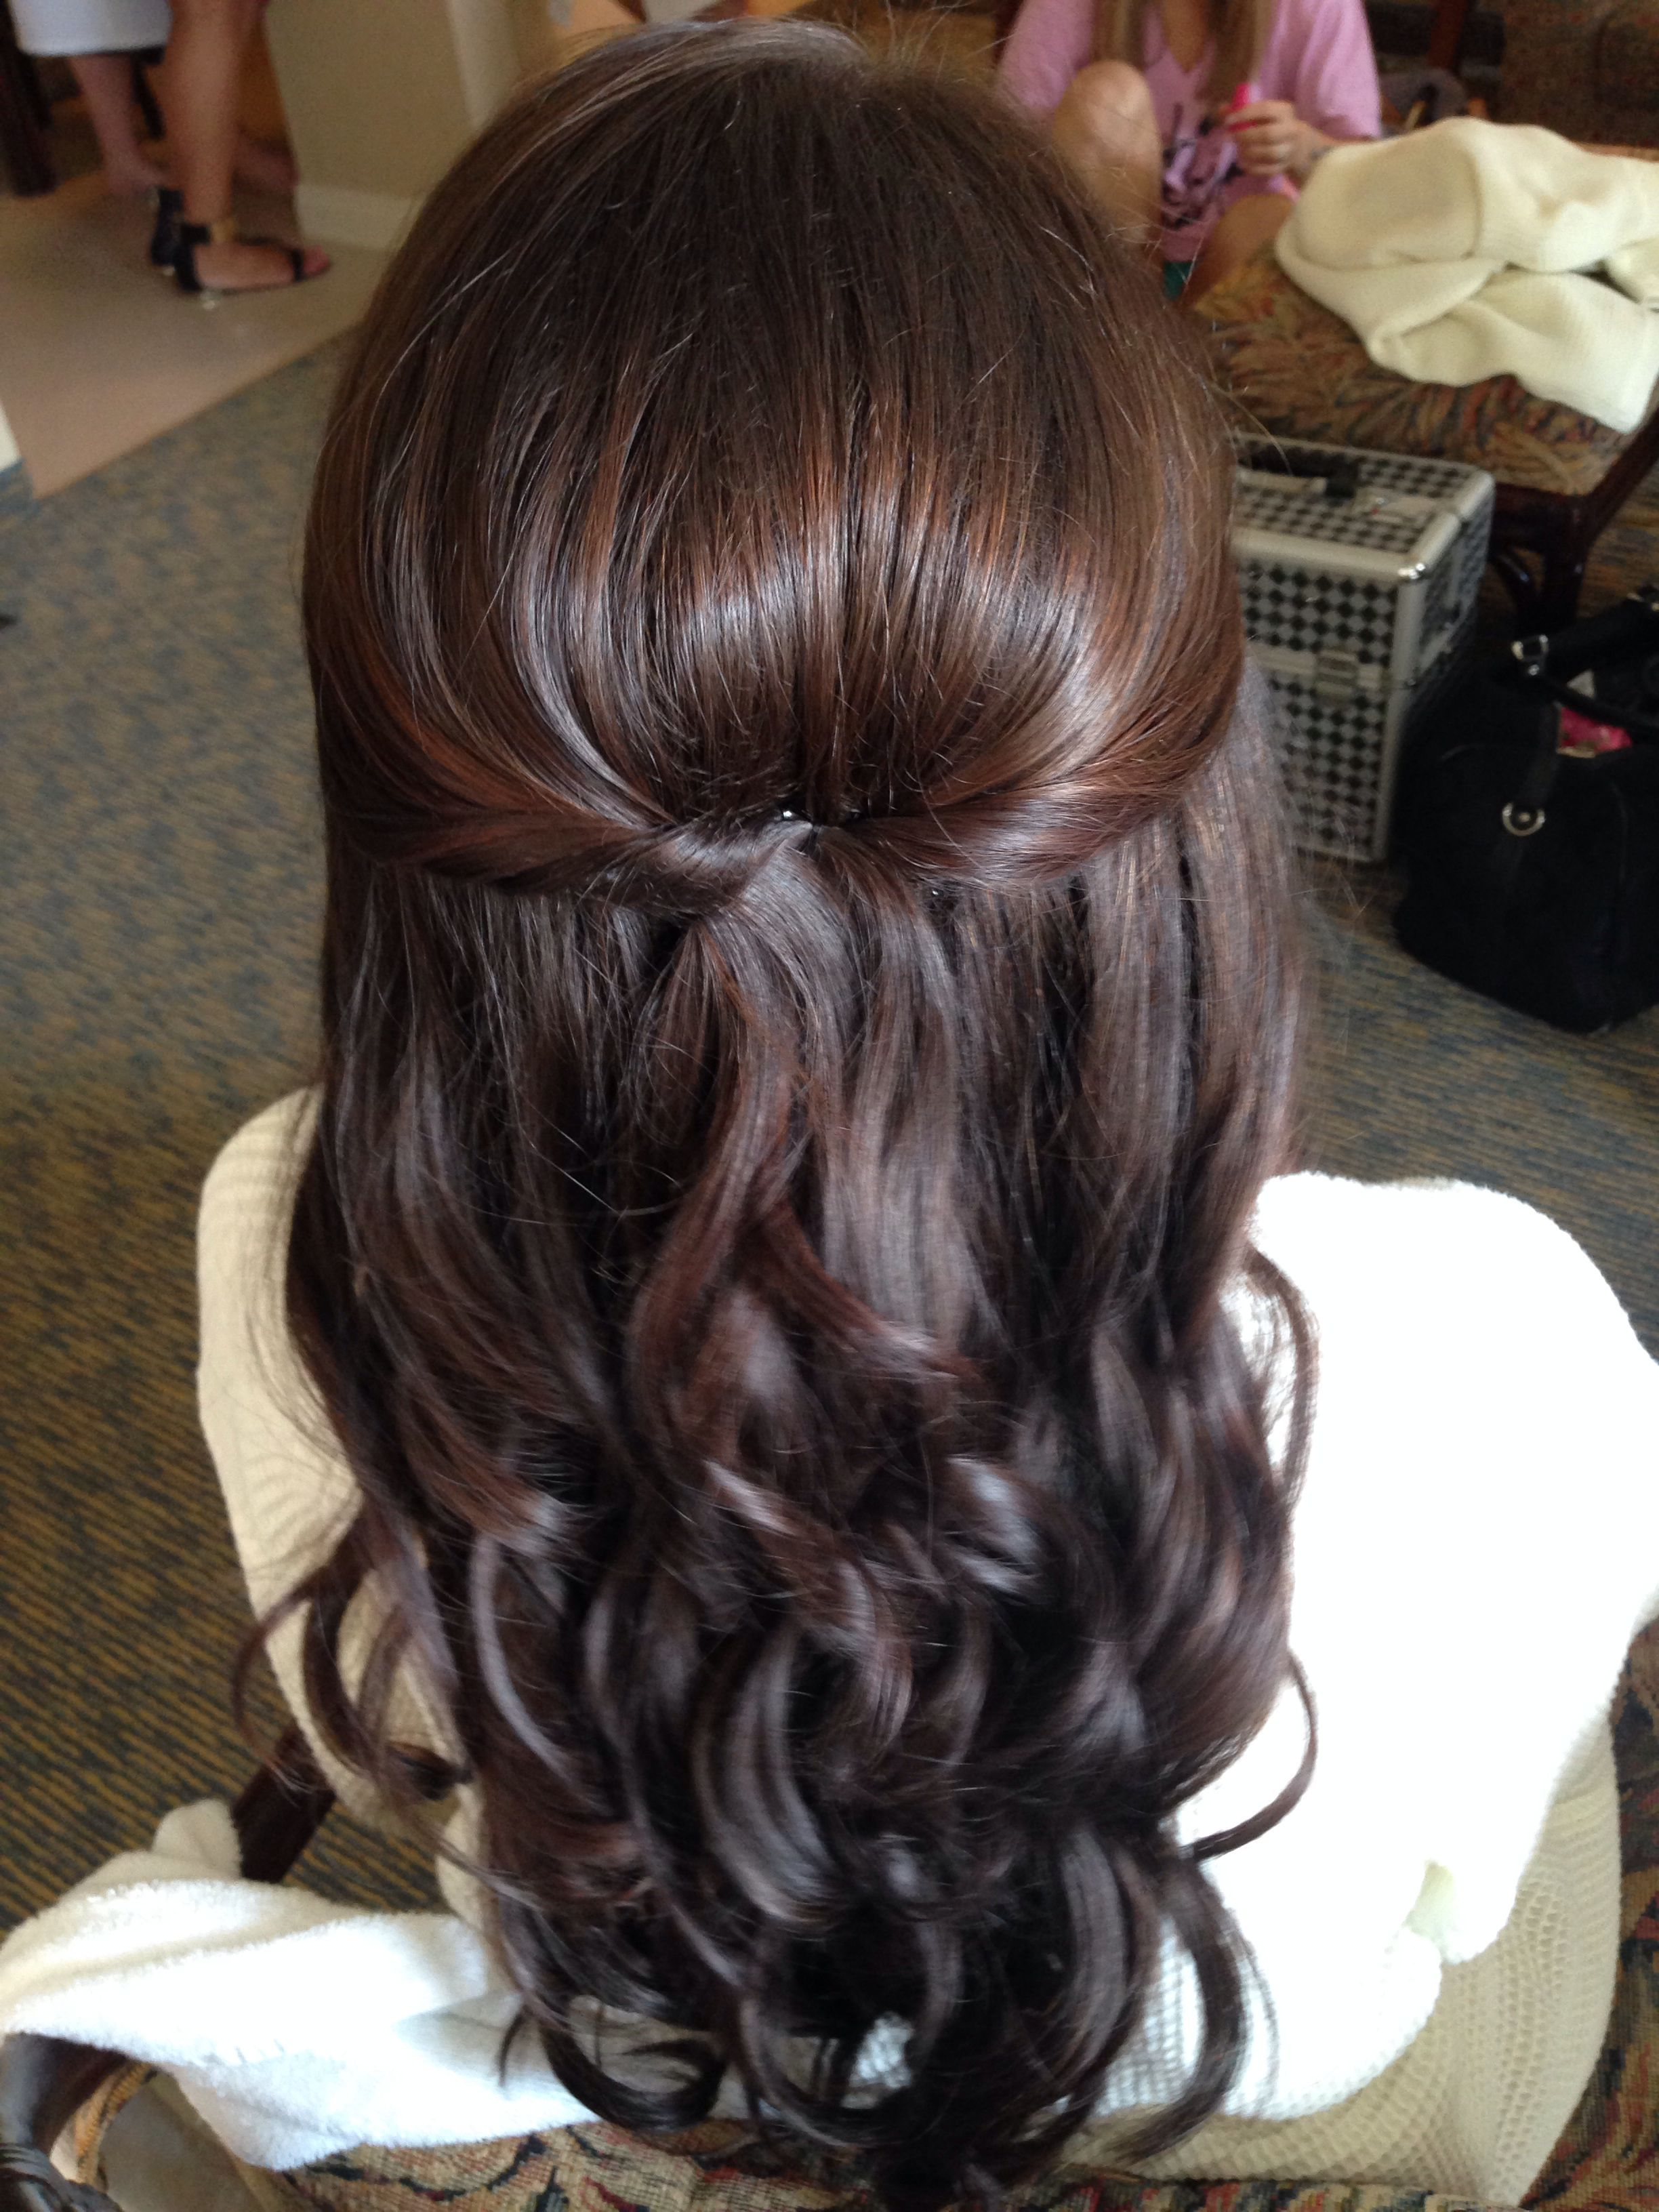 Fancy Hairstyles Wedding Hair Carly Bowers Seaton  Wedding Hair  Pinterest